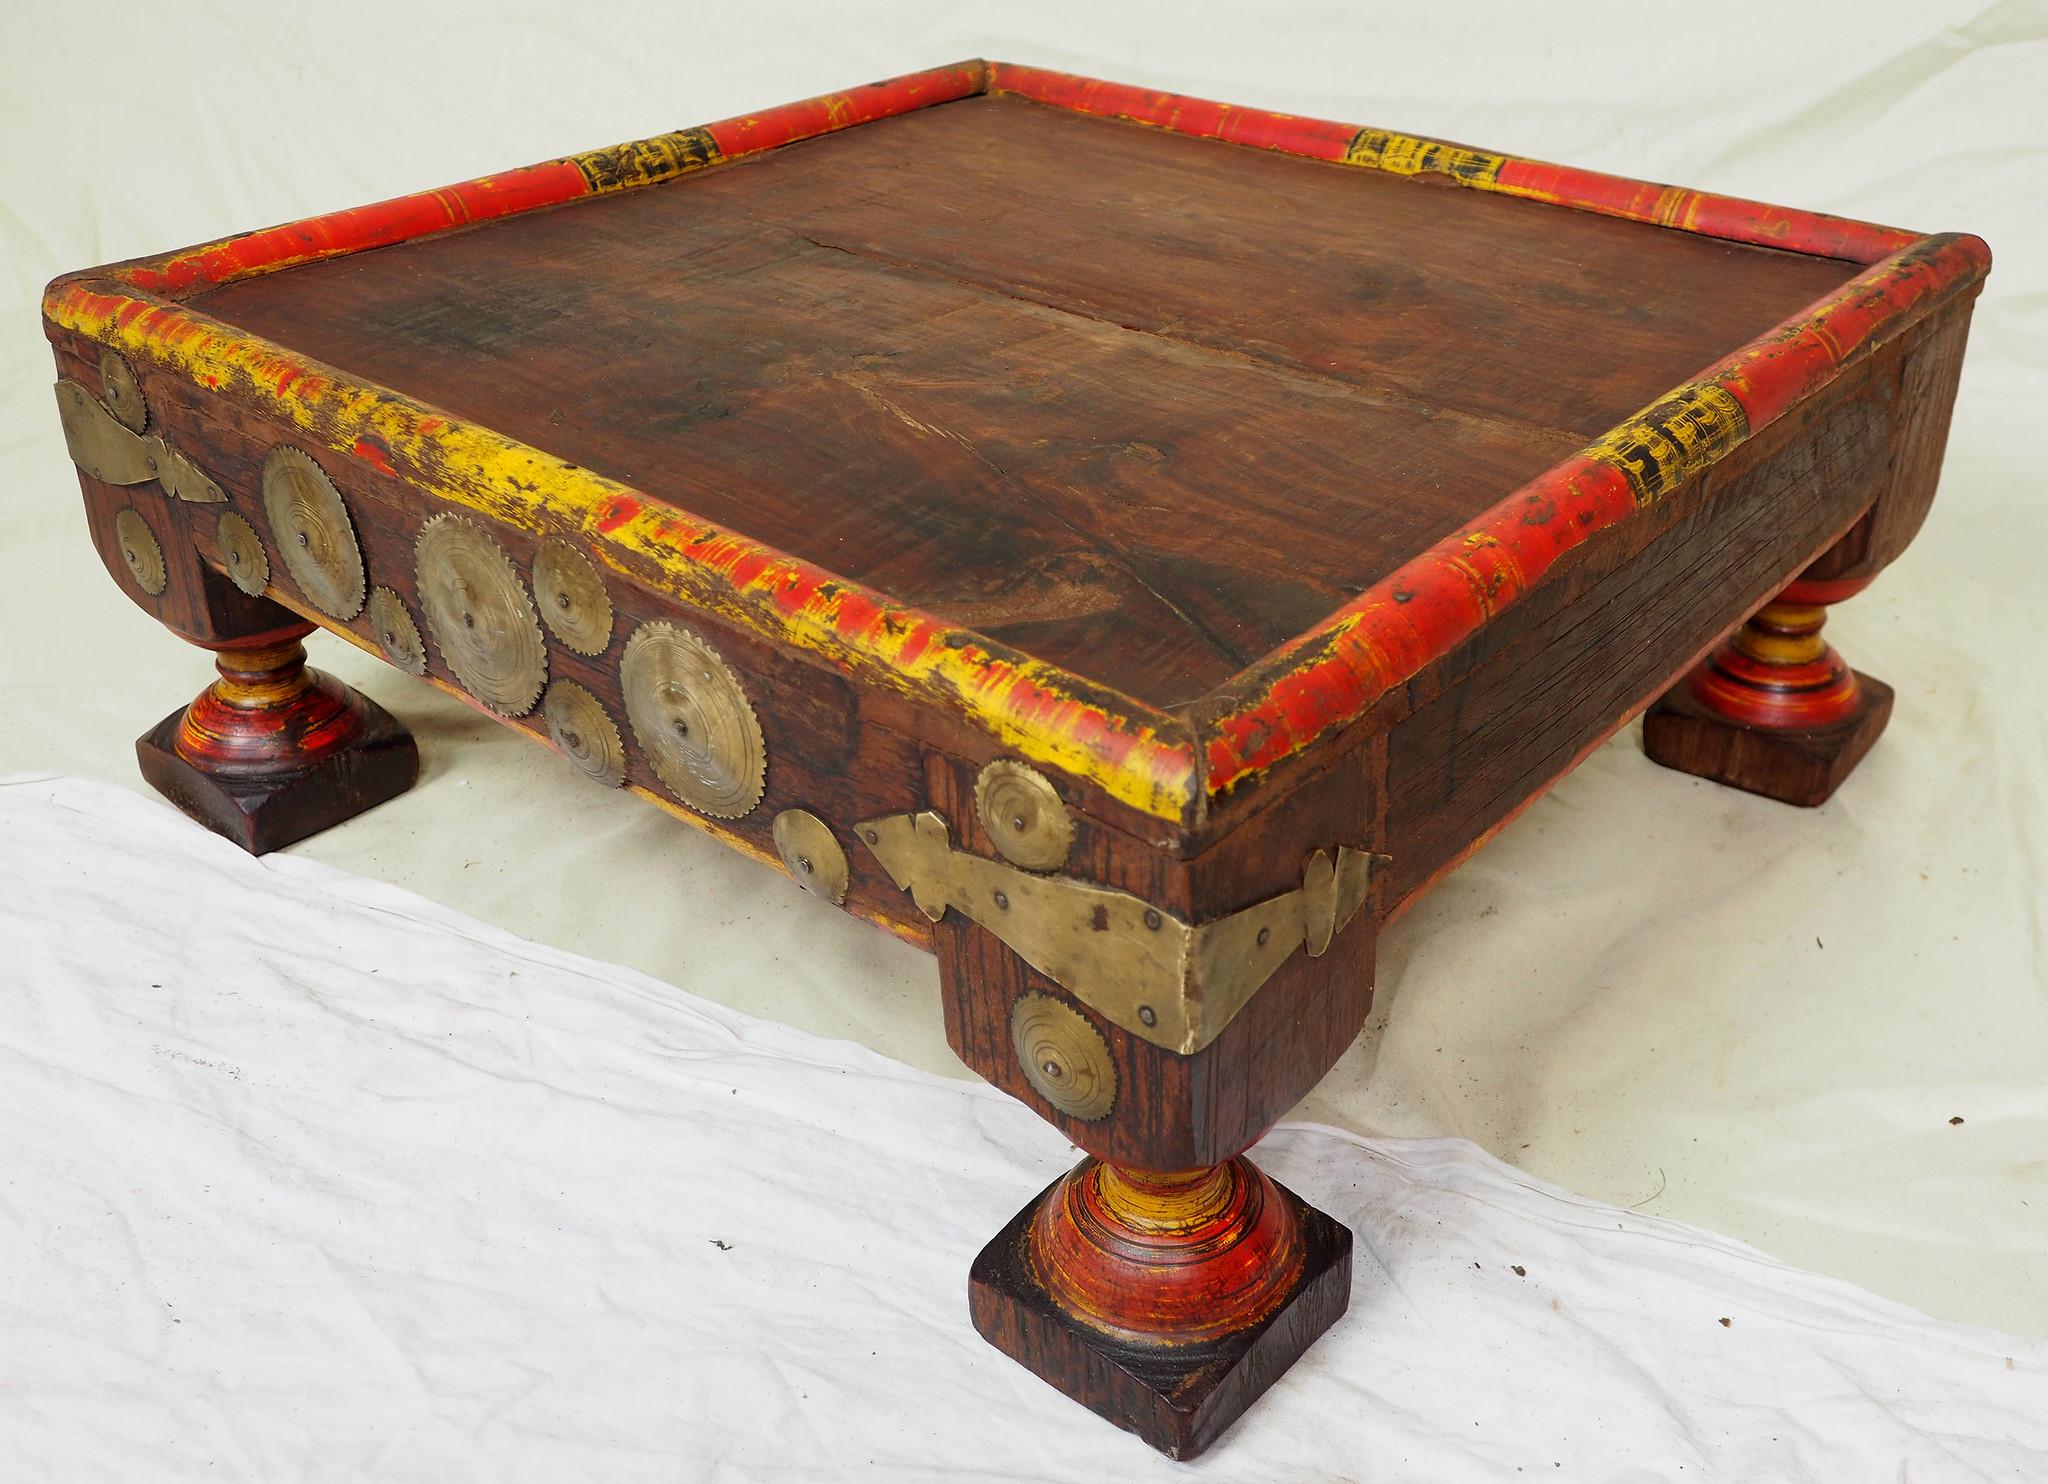 53x53 cm Antik Massivholz handgeschnitzte orient Teetisch beisteltisch Tisch Hocker Messing verziert aus Afghanistan Nr-21/4